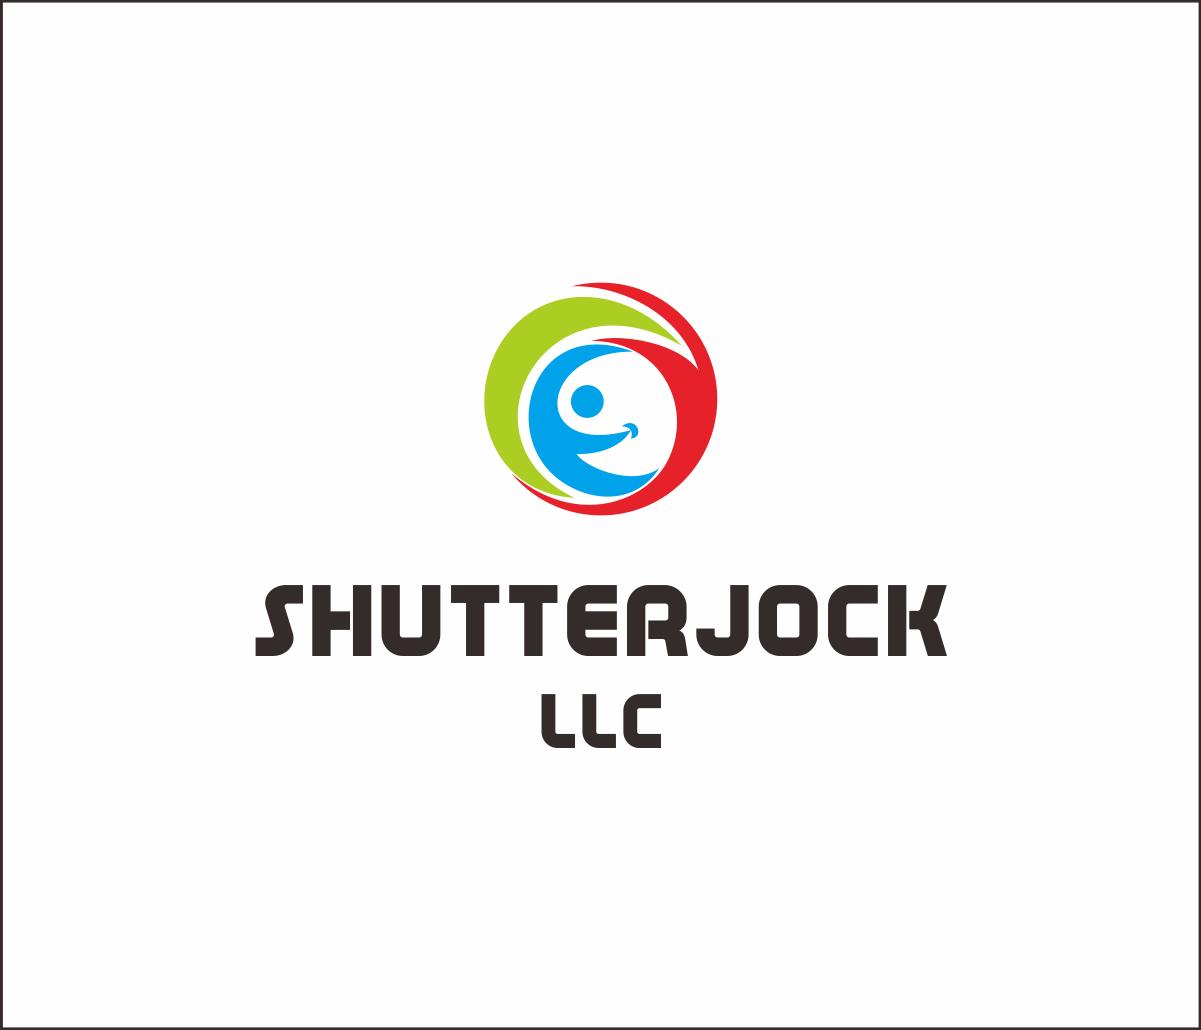 Logo Design by Armada Jamaluddin - Entry No. 69 in the Logo Design Contest Unique Logo Design Wanted for Shutterjock LLC.